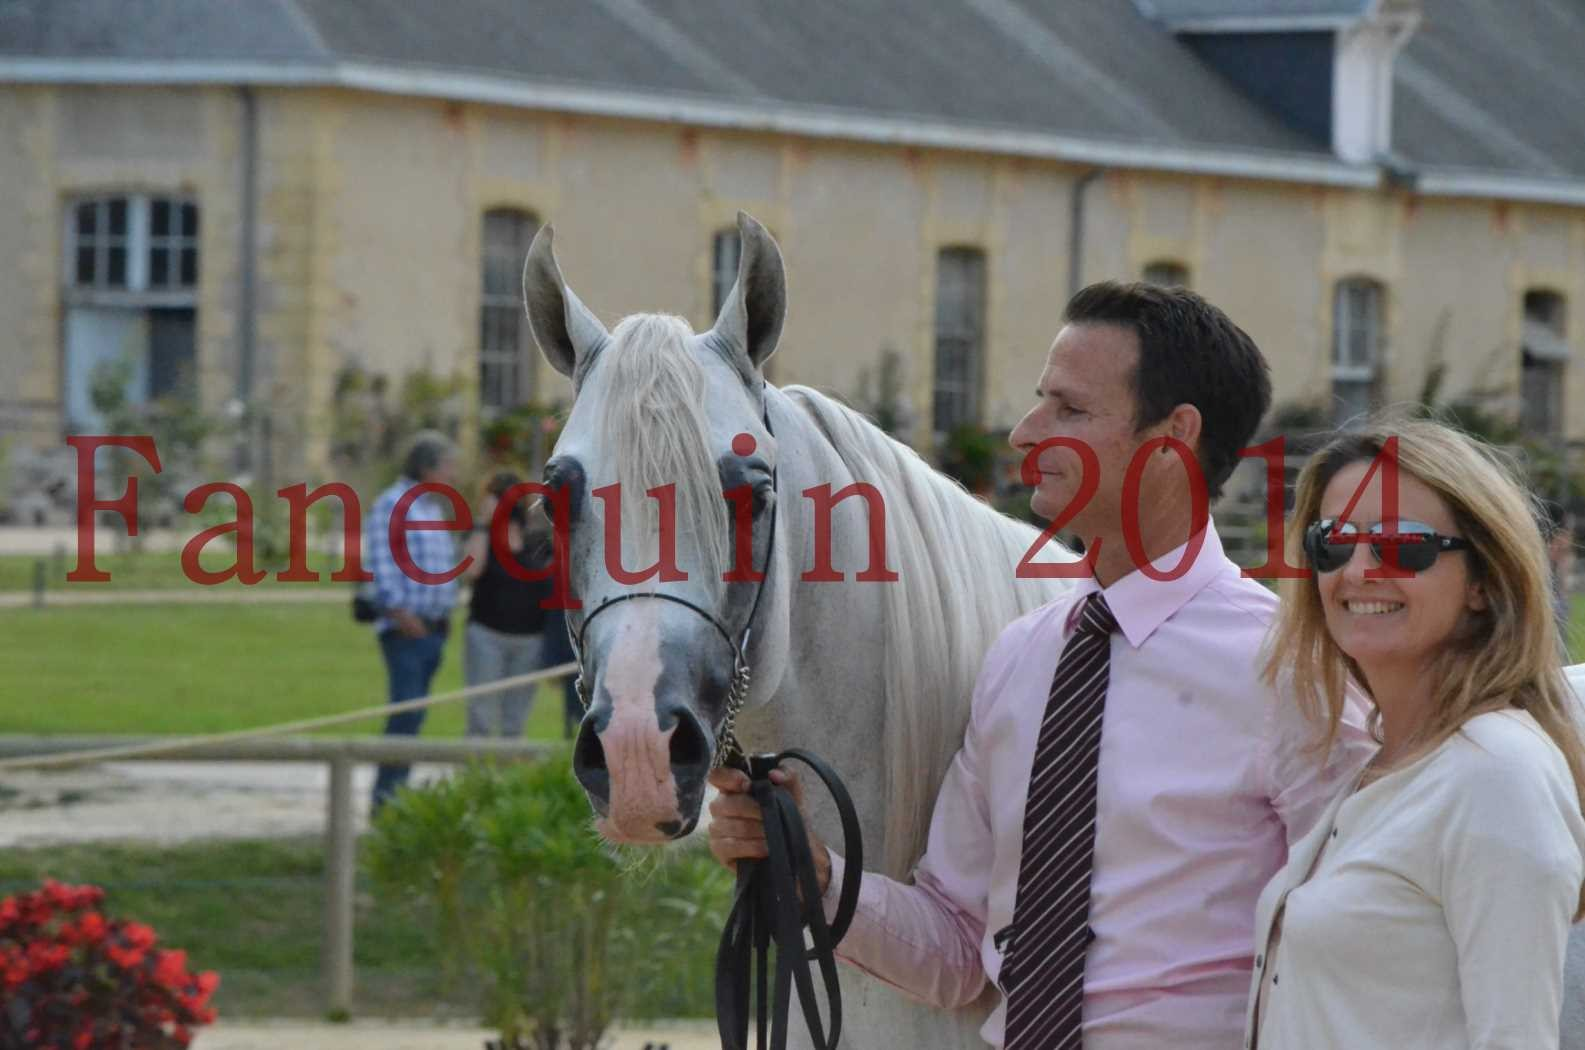 CHAMPIONNAT DE FRANCE 2014 A POMPADOUR - Championnat - FA STARLIGHT - 14